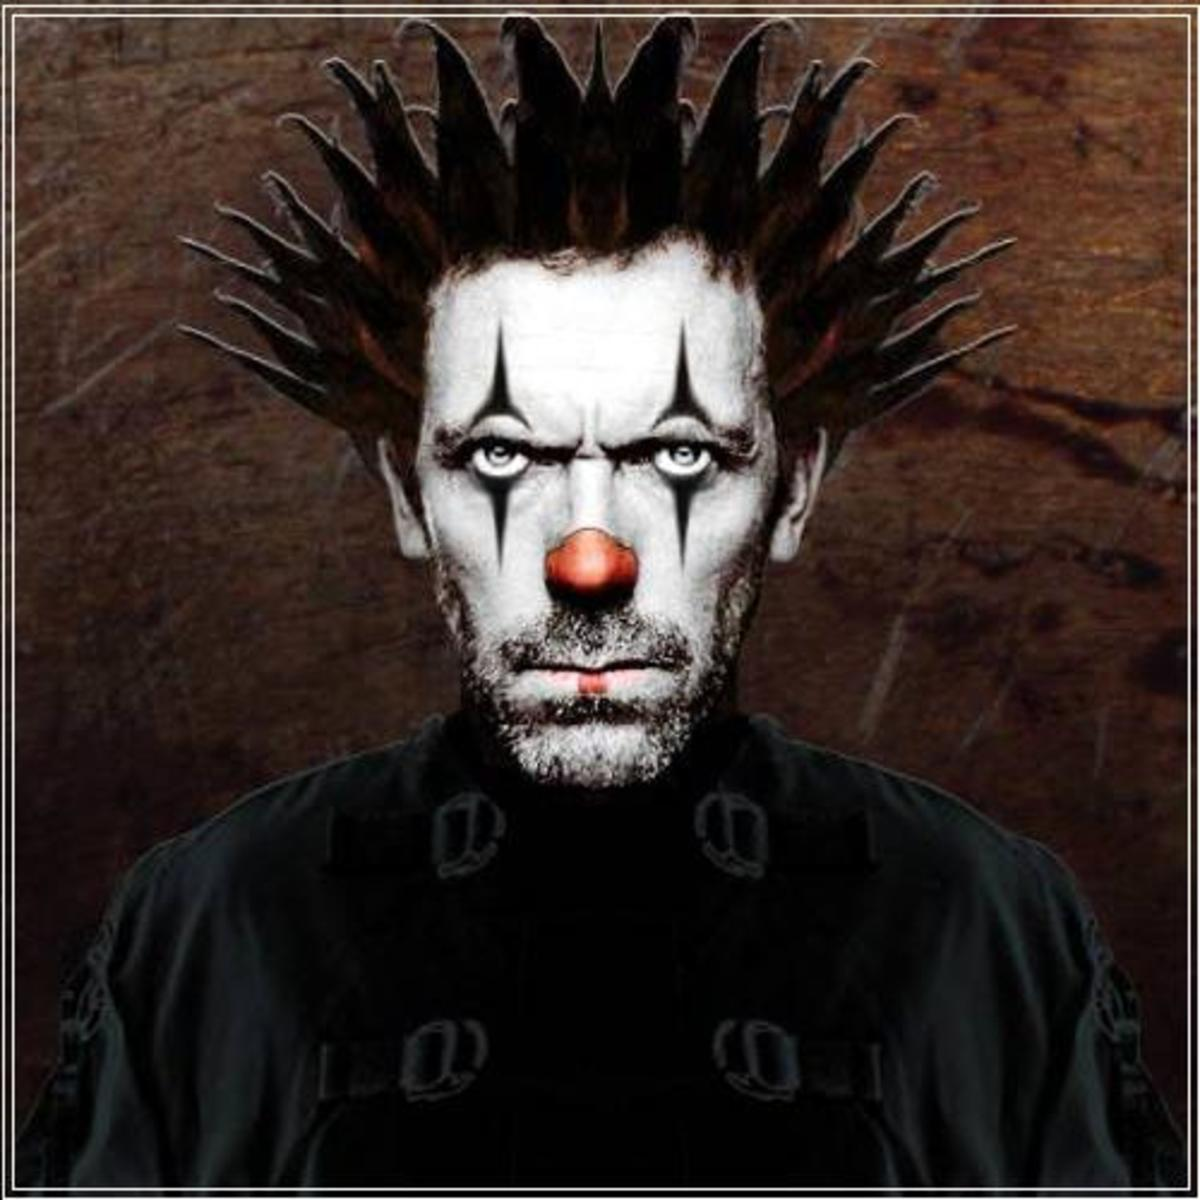 Chiron symbolizes a clown